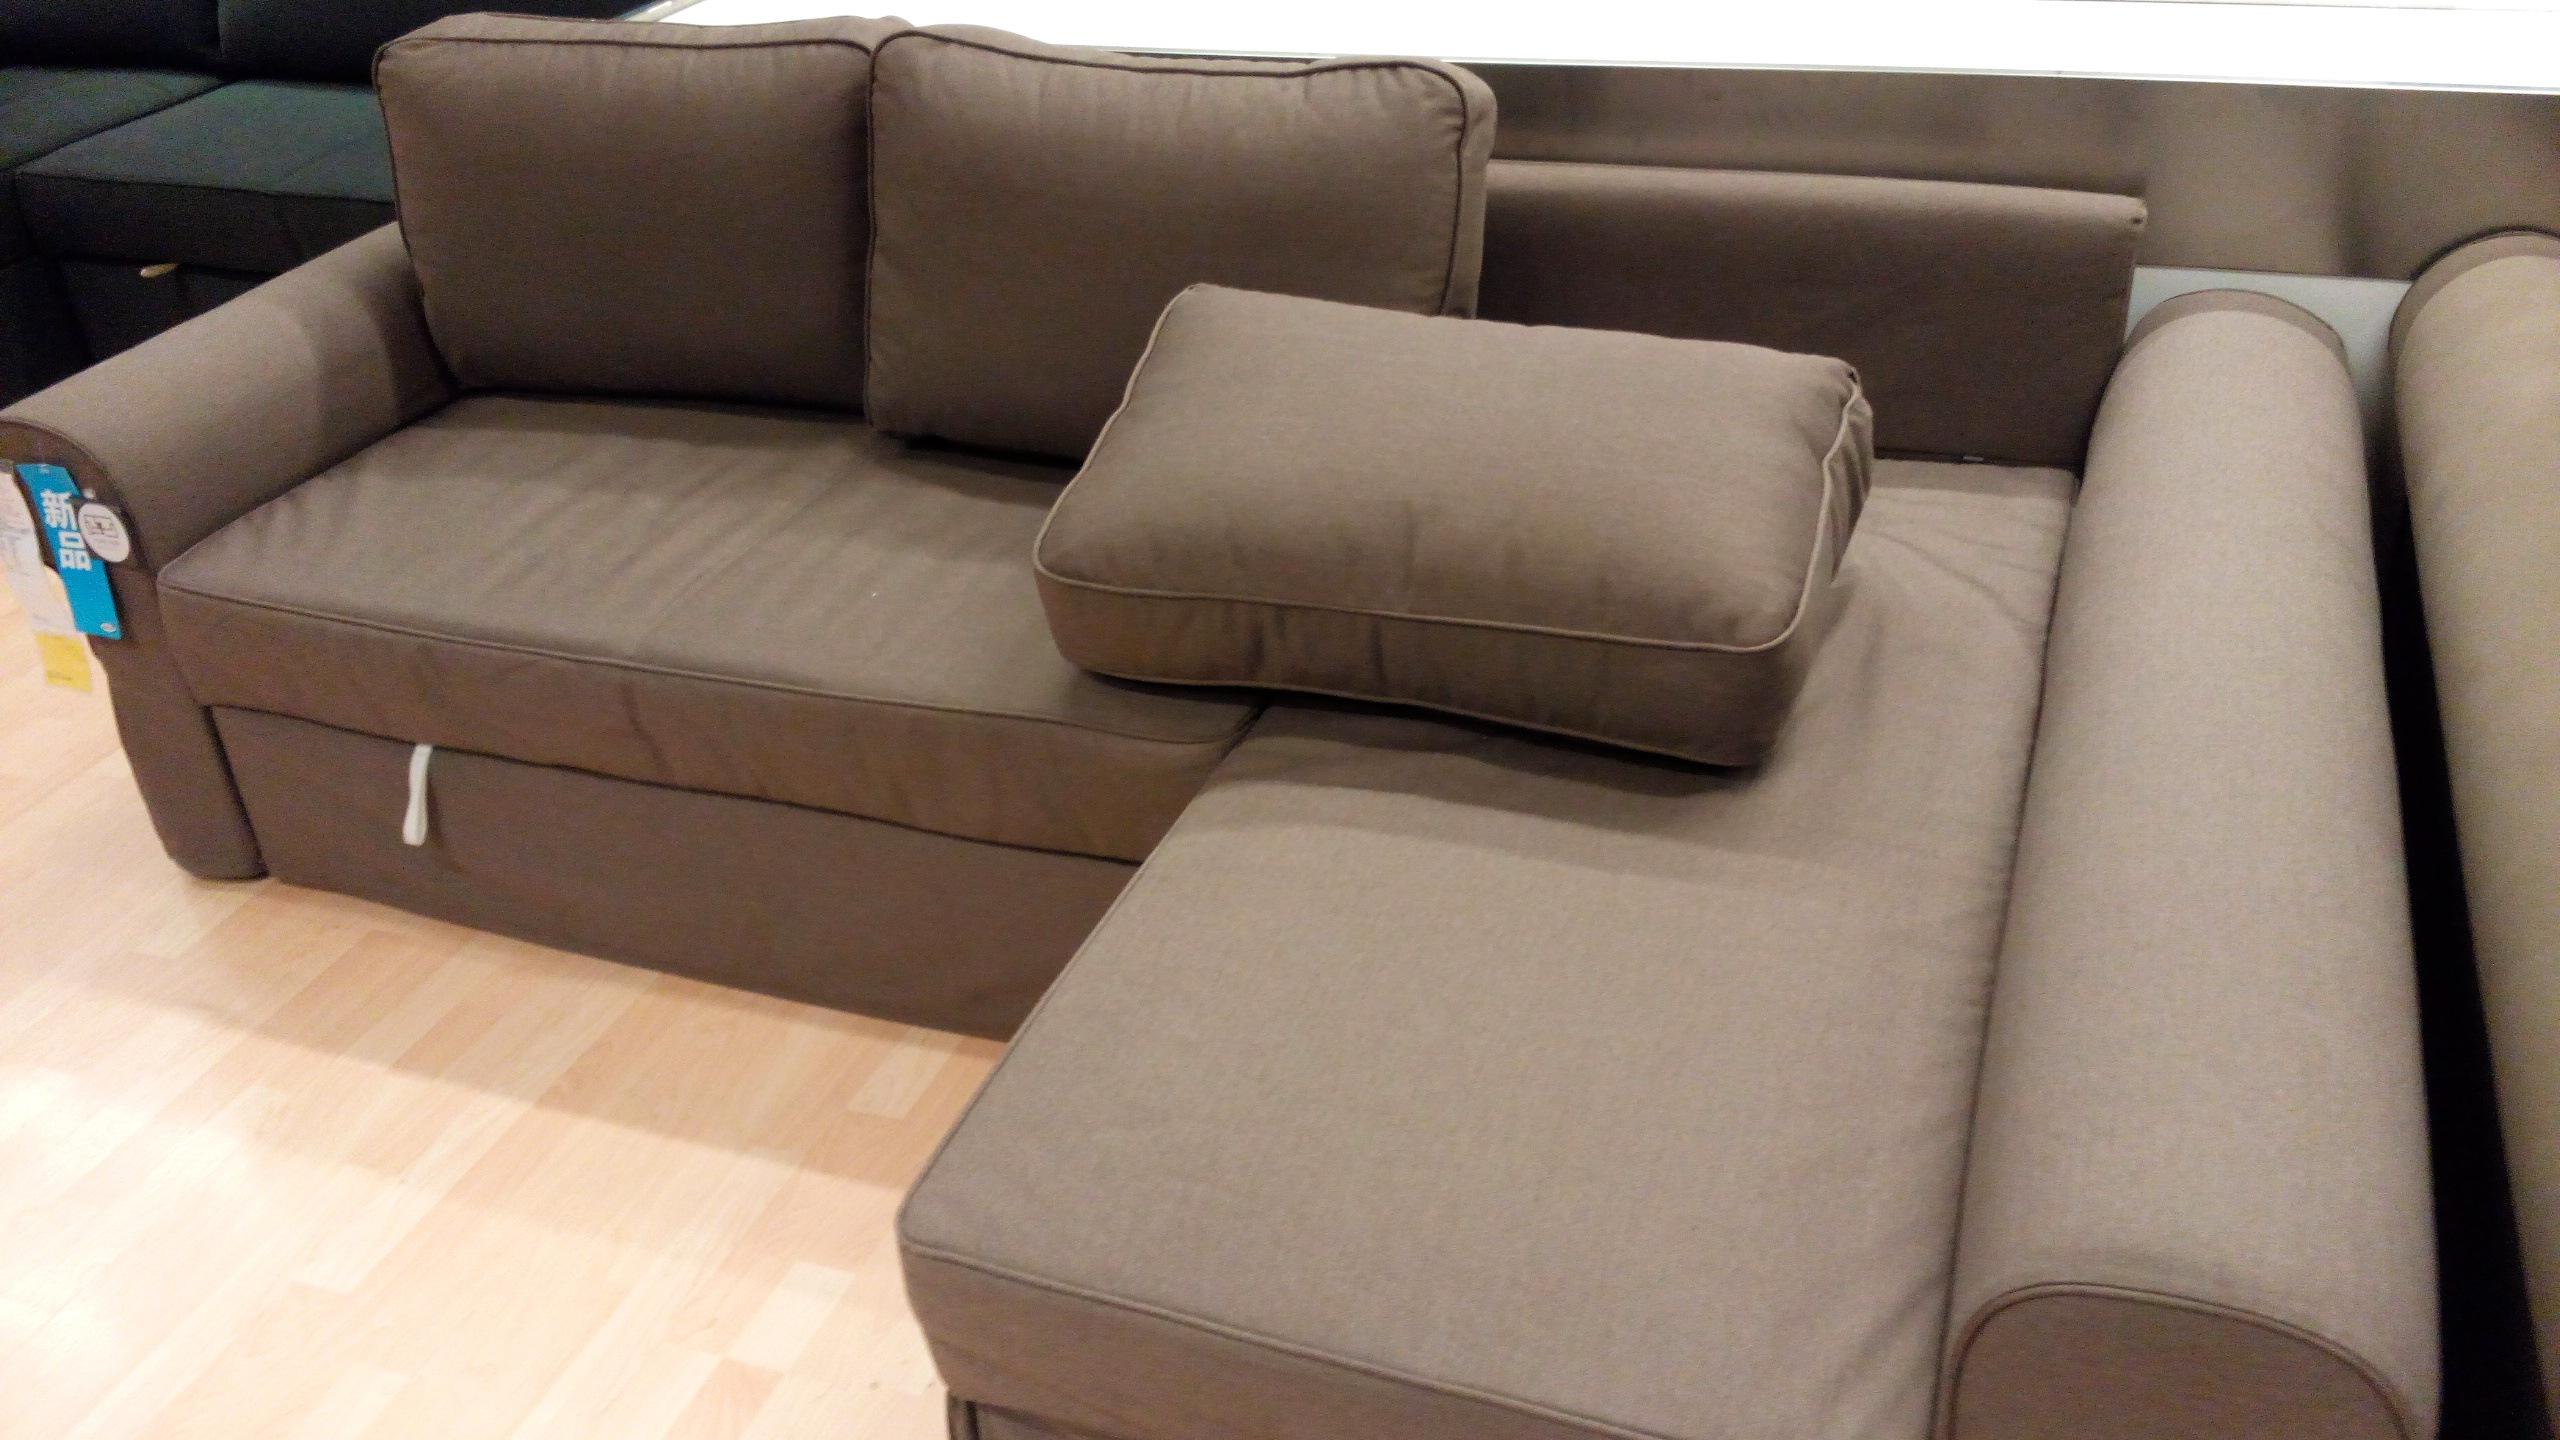 Friheten Ikea Avis Impressionnant Photos Awesome Friheten sofa Bed Review Designsolutions Usa